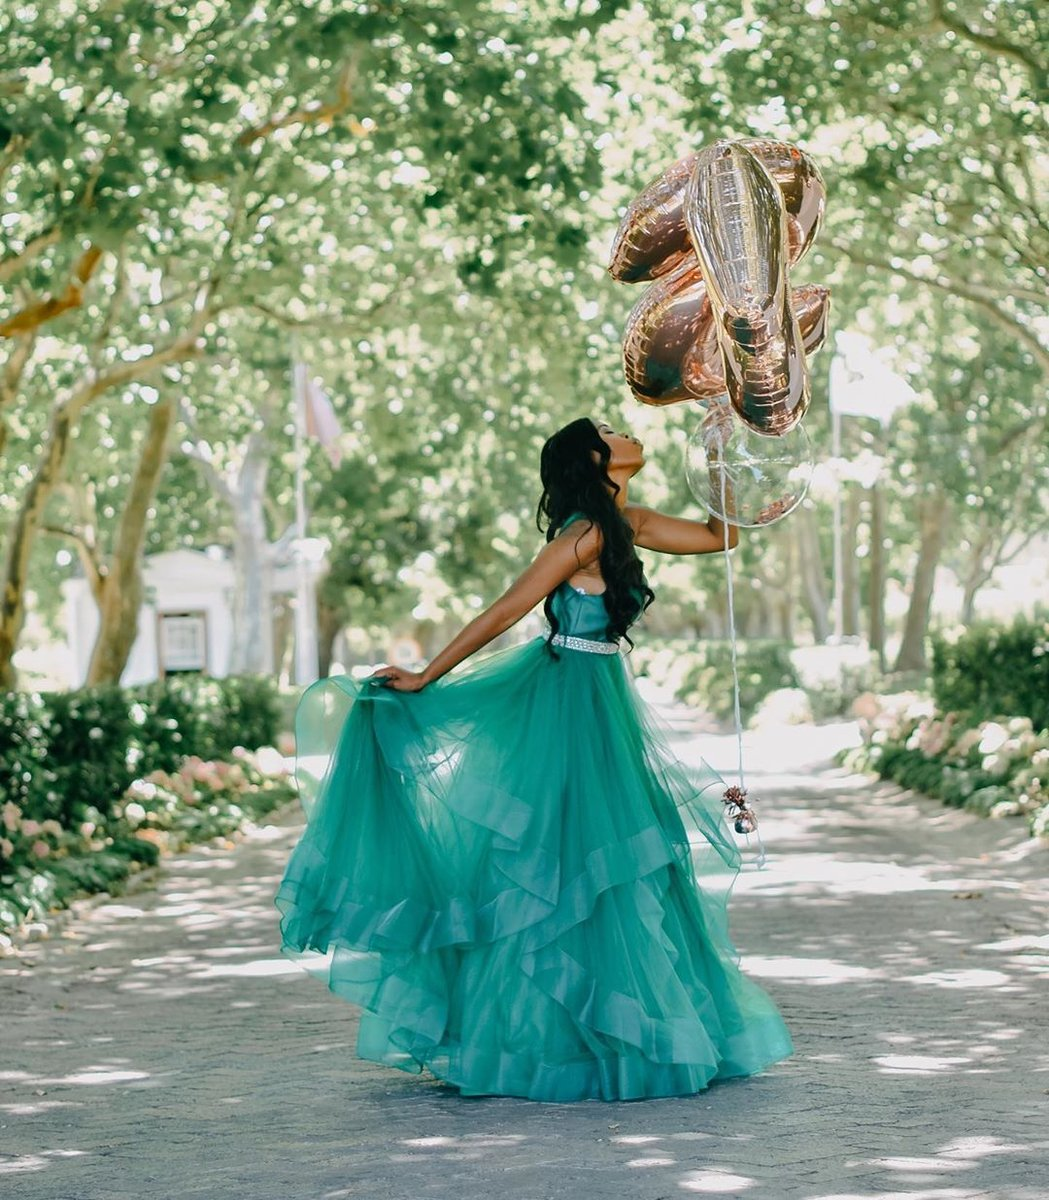 #repost @thandekasivunga looking picture-perfect in style 60388!  For style information, visit: https://t.co/Tmju4xFBtC  #alycegirl #greenballgown #promgoals #prom2k20 #glam #ballgown #layeredskirt #eveningwear #formalwear #gala #redcarpet #alyceparis #dreamersanddressmakers https://t.co/5uYcDf3Fon